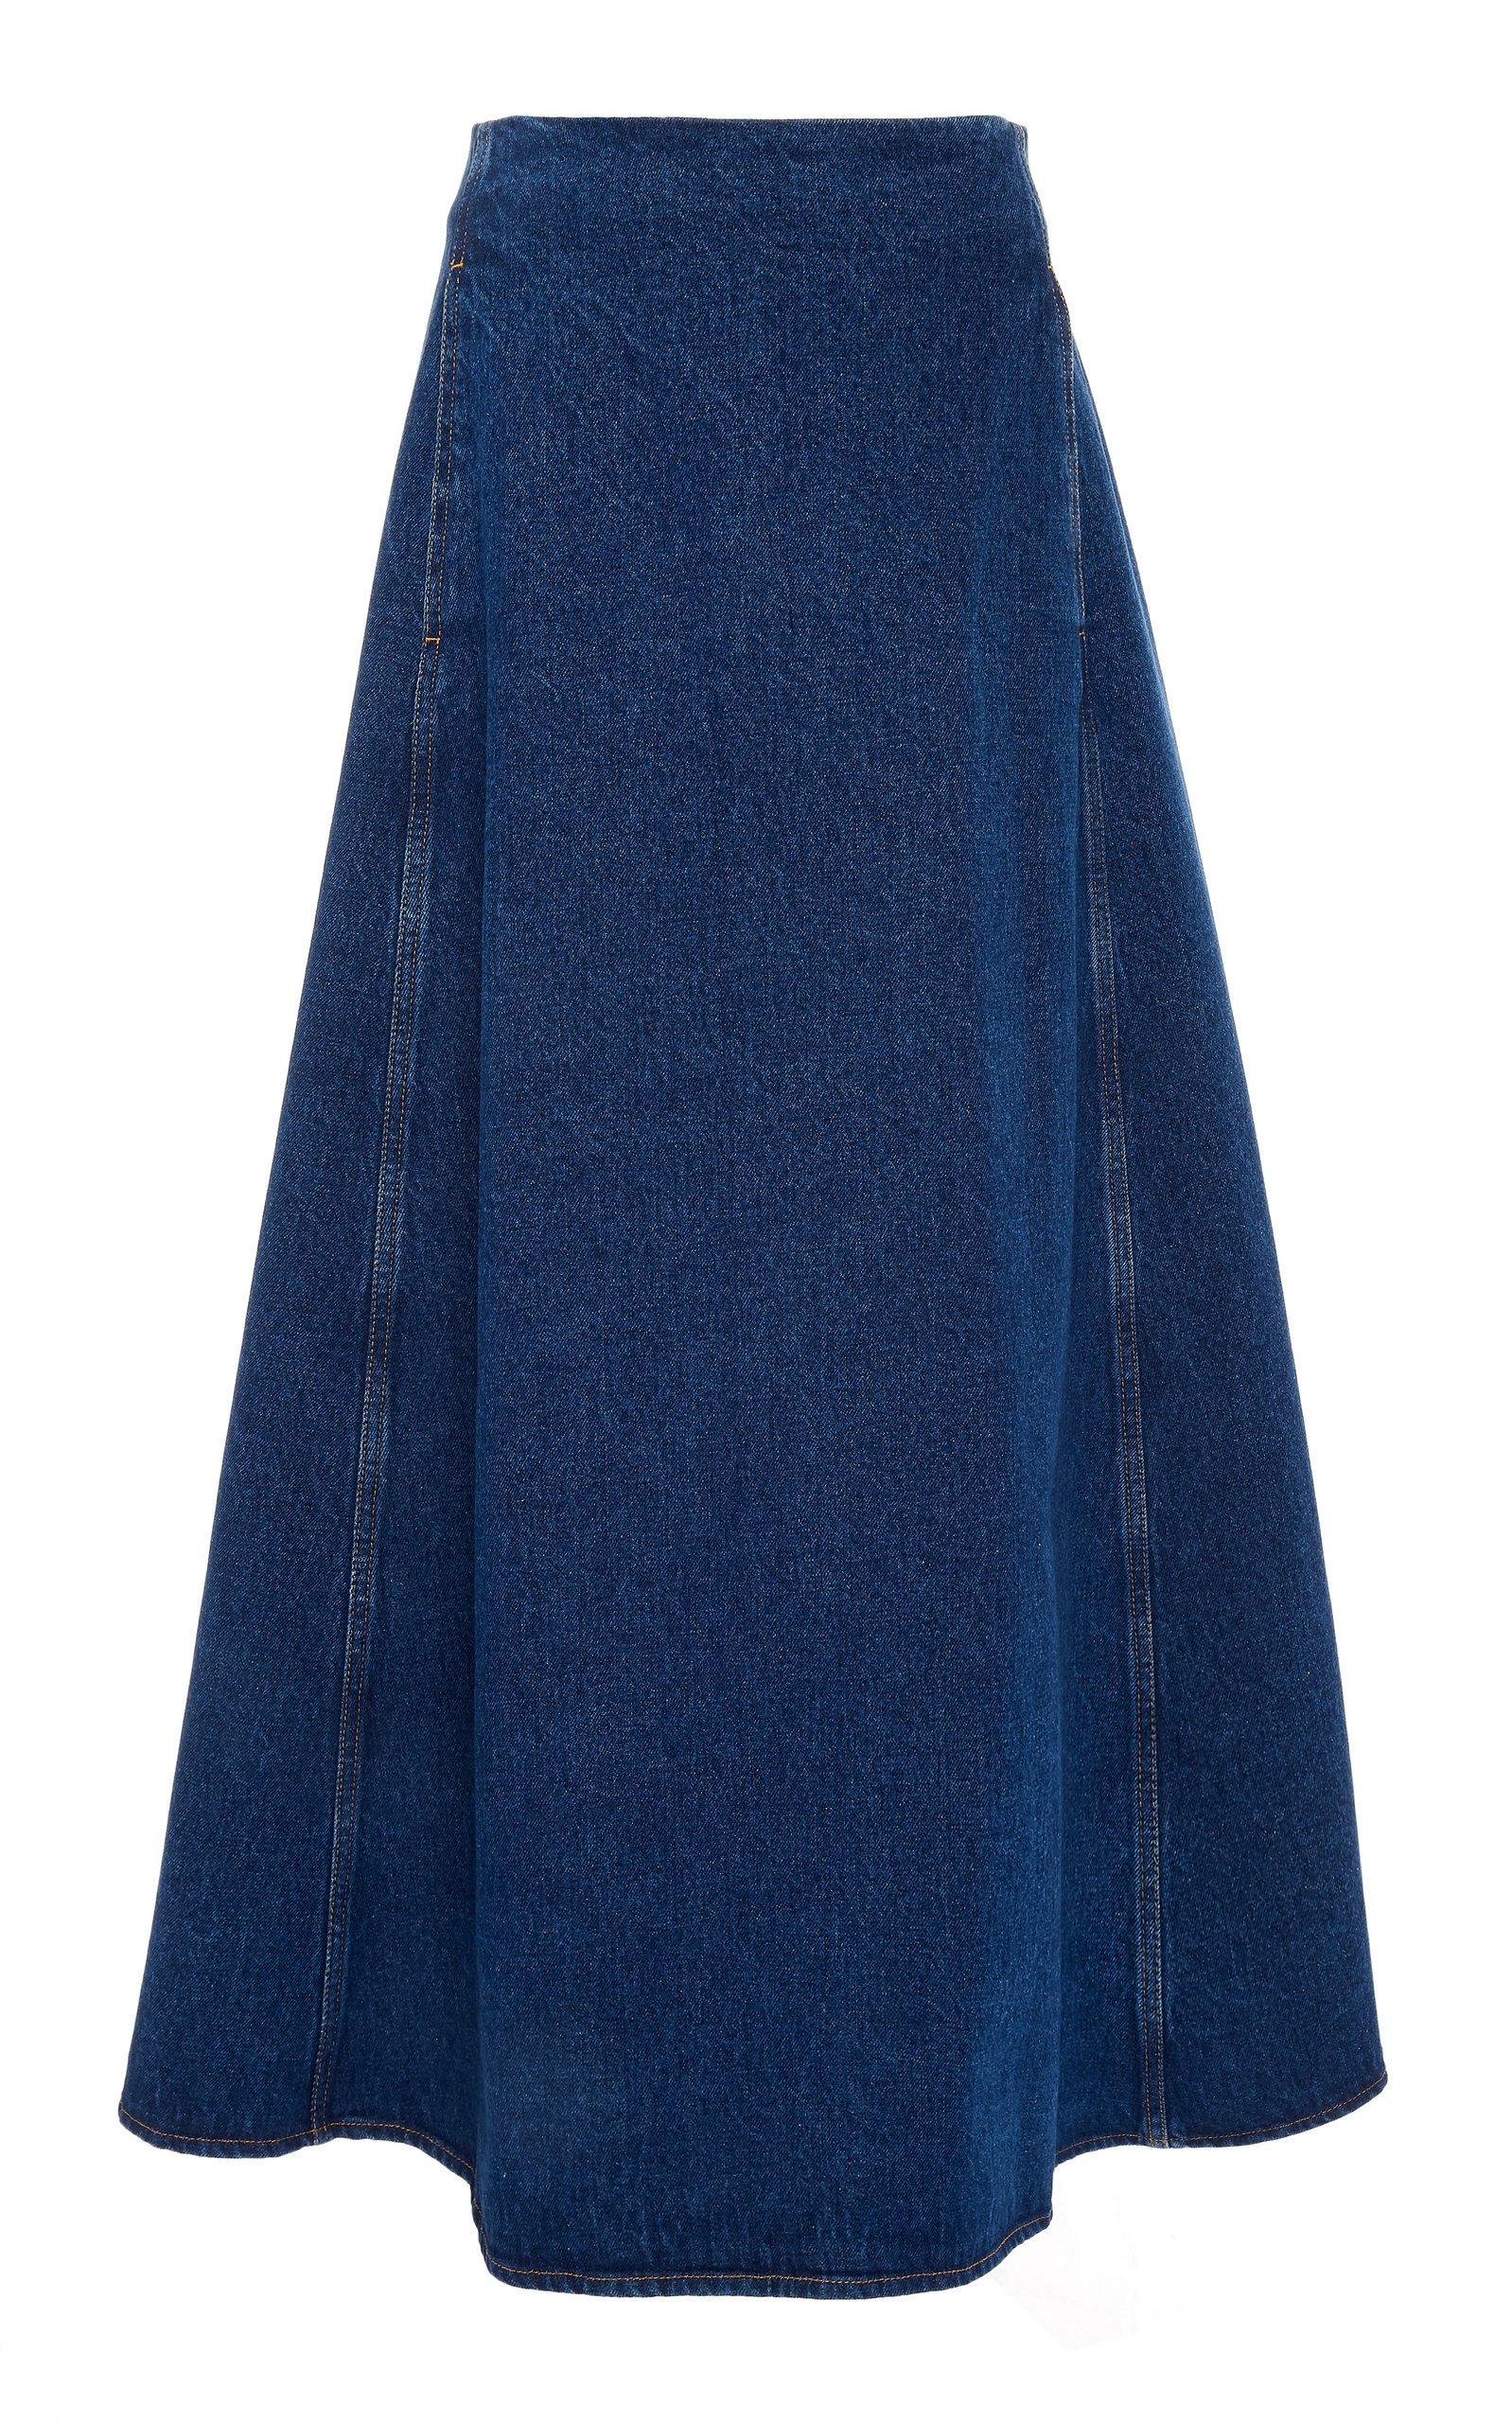 MM6 Denim A-Line Midi Skirt